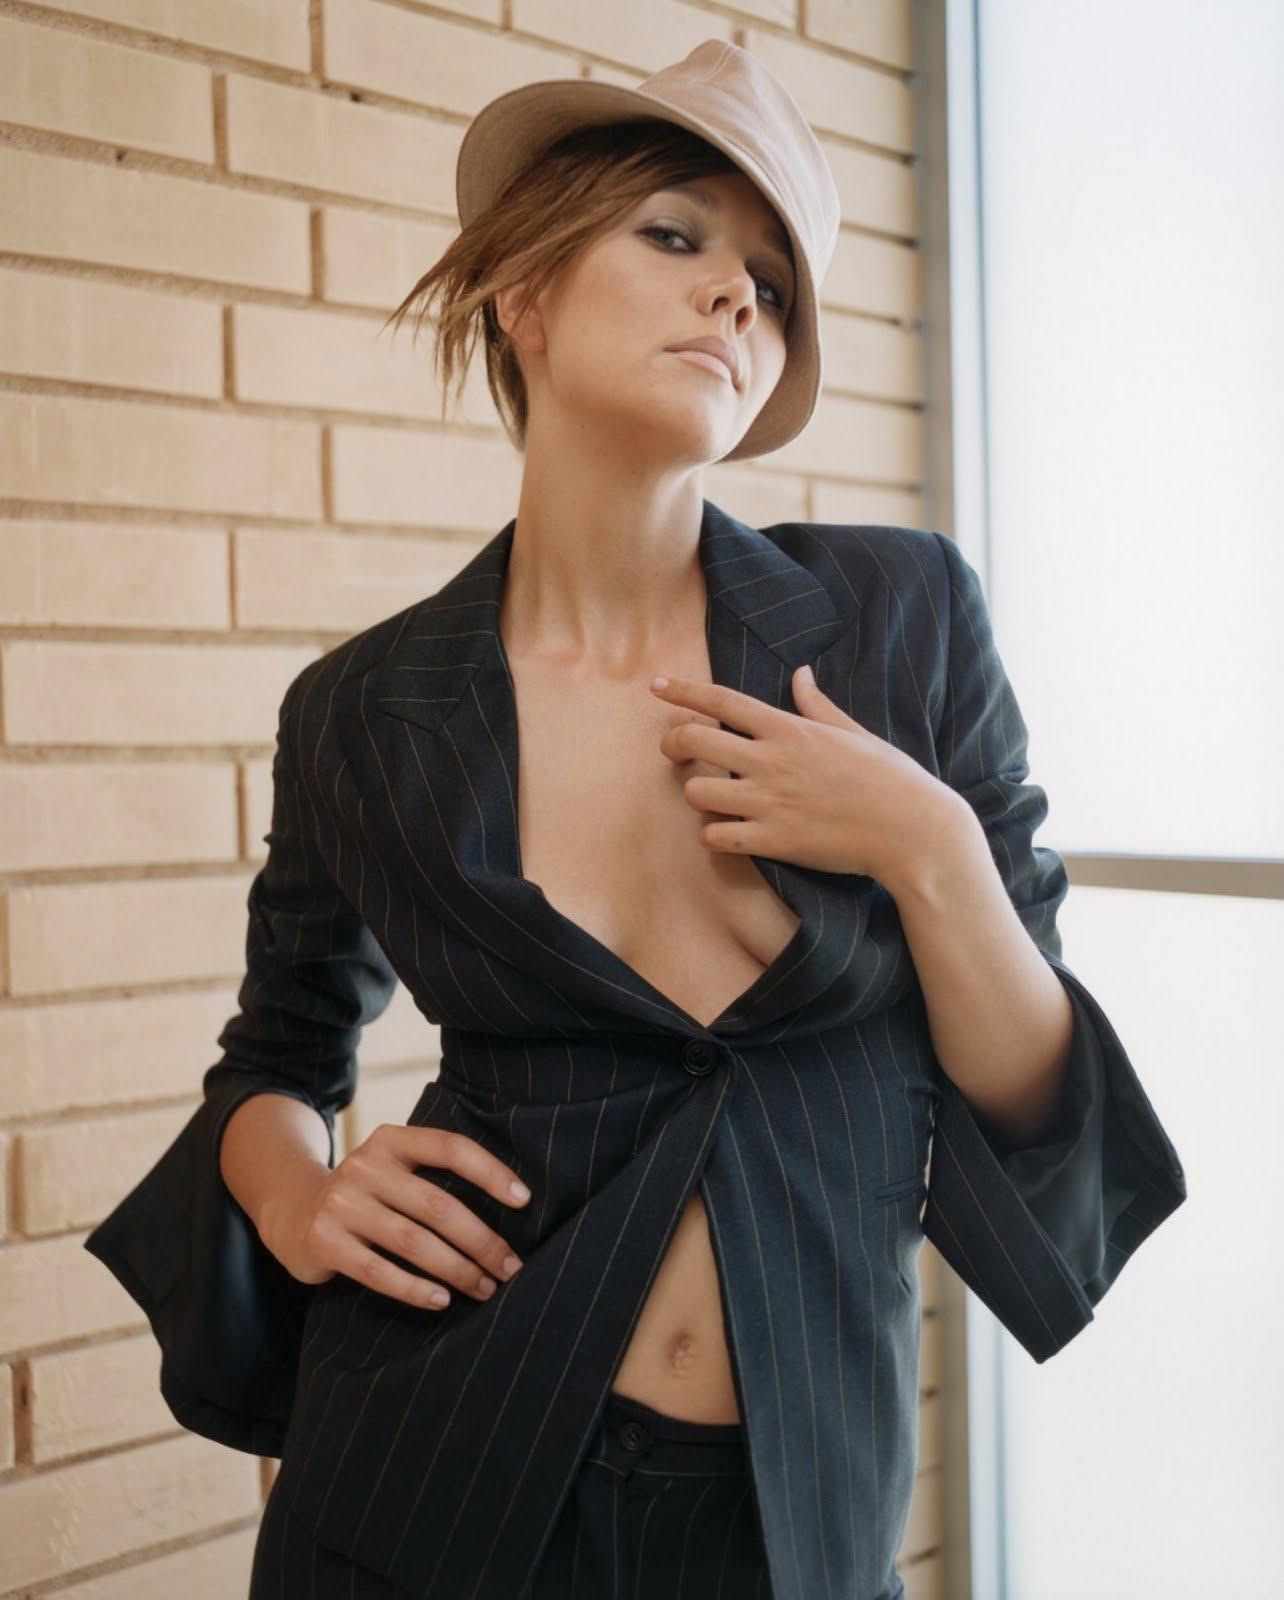 http://1.bp.blogspot.com/-MPwjEJQ_sDQ/TlJHmDrt1TI/AAAAAAAAAIk/aaP6N2CEGCw/s1600/Maggie+Gyllenhaal+.jpg